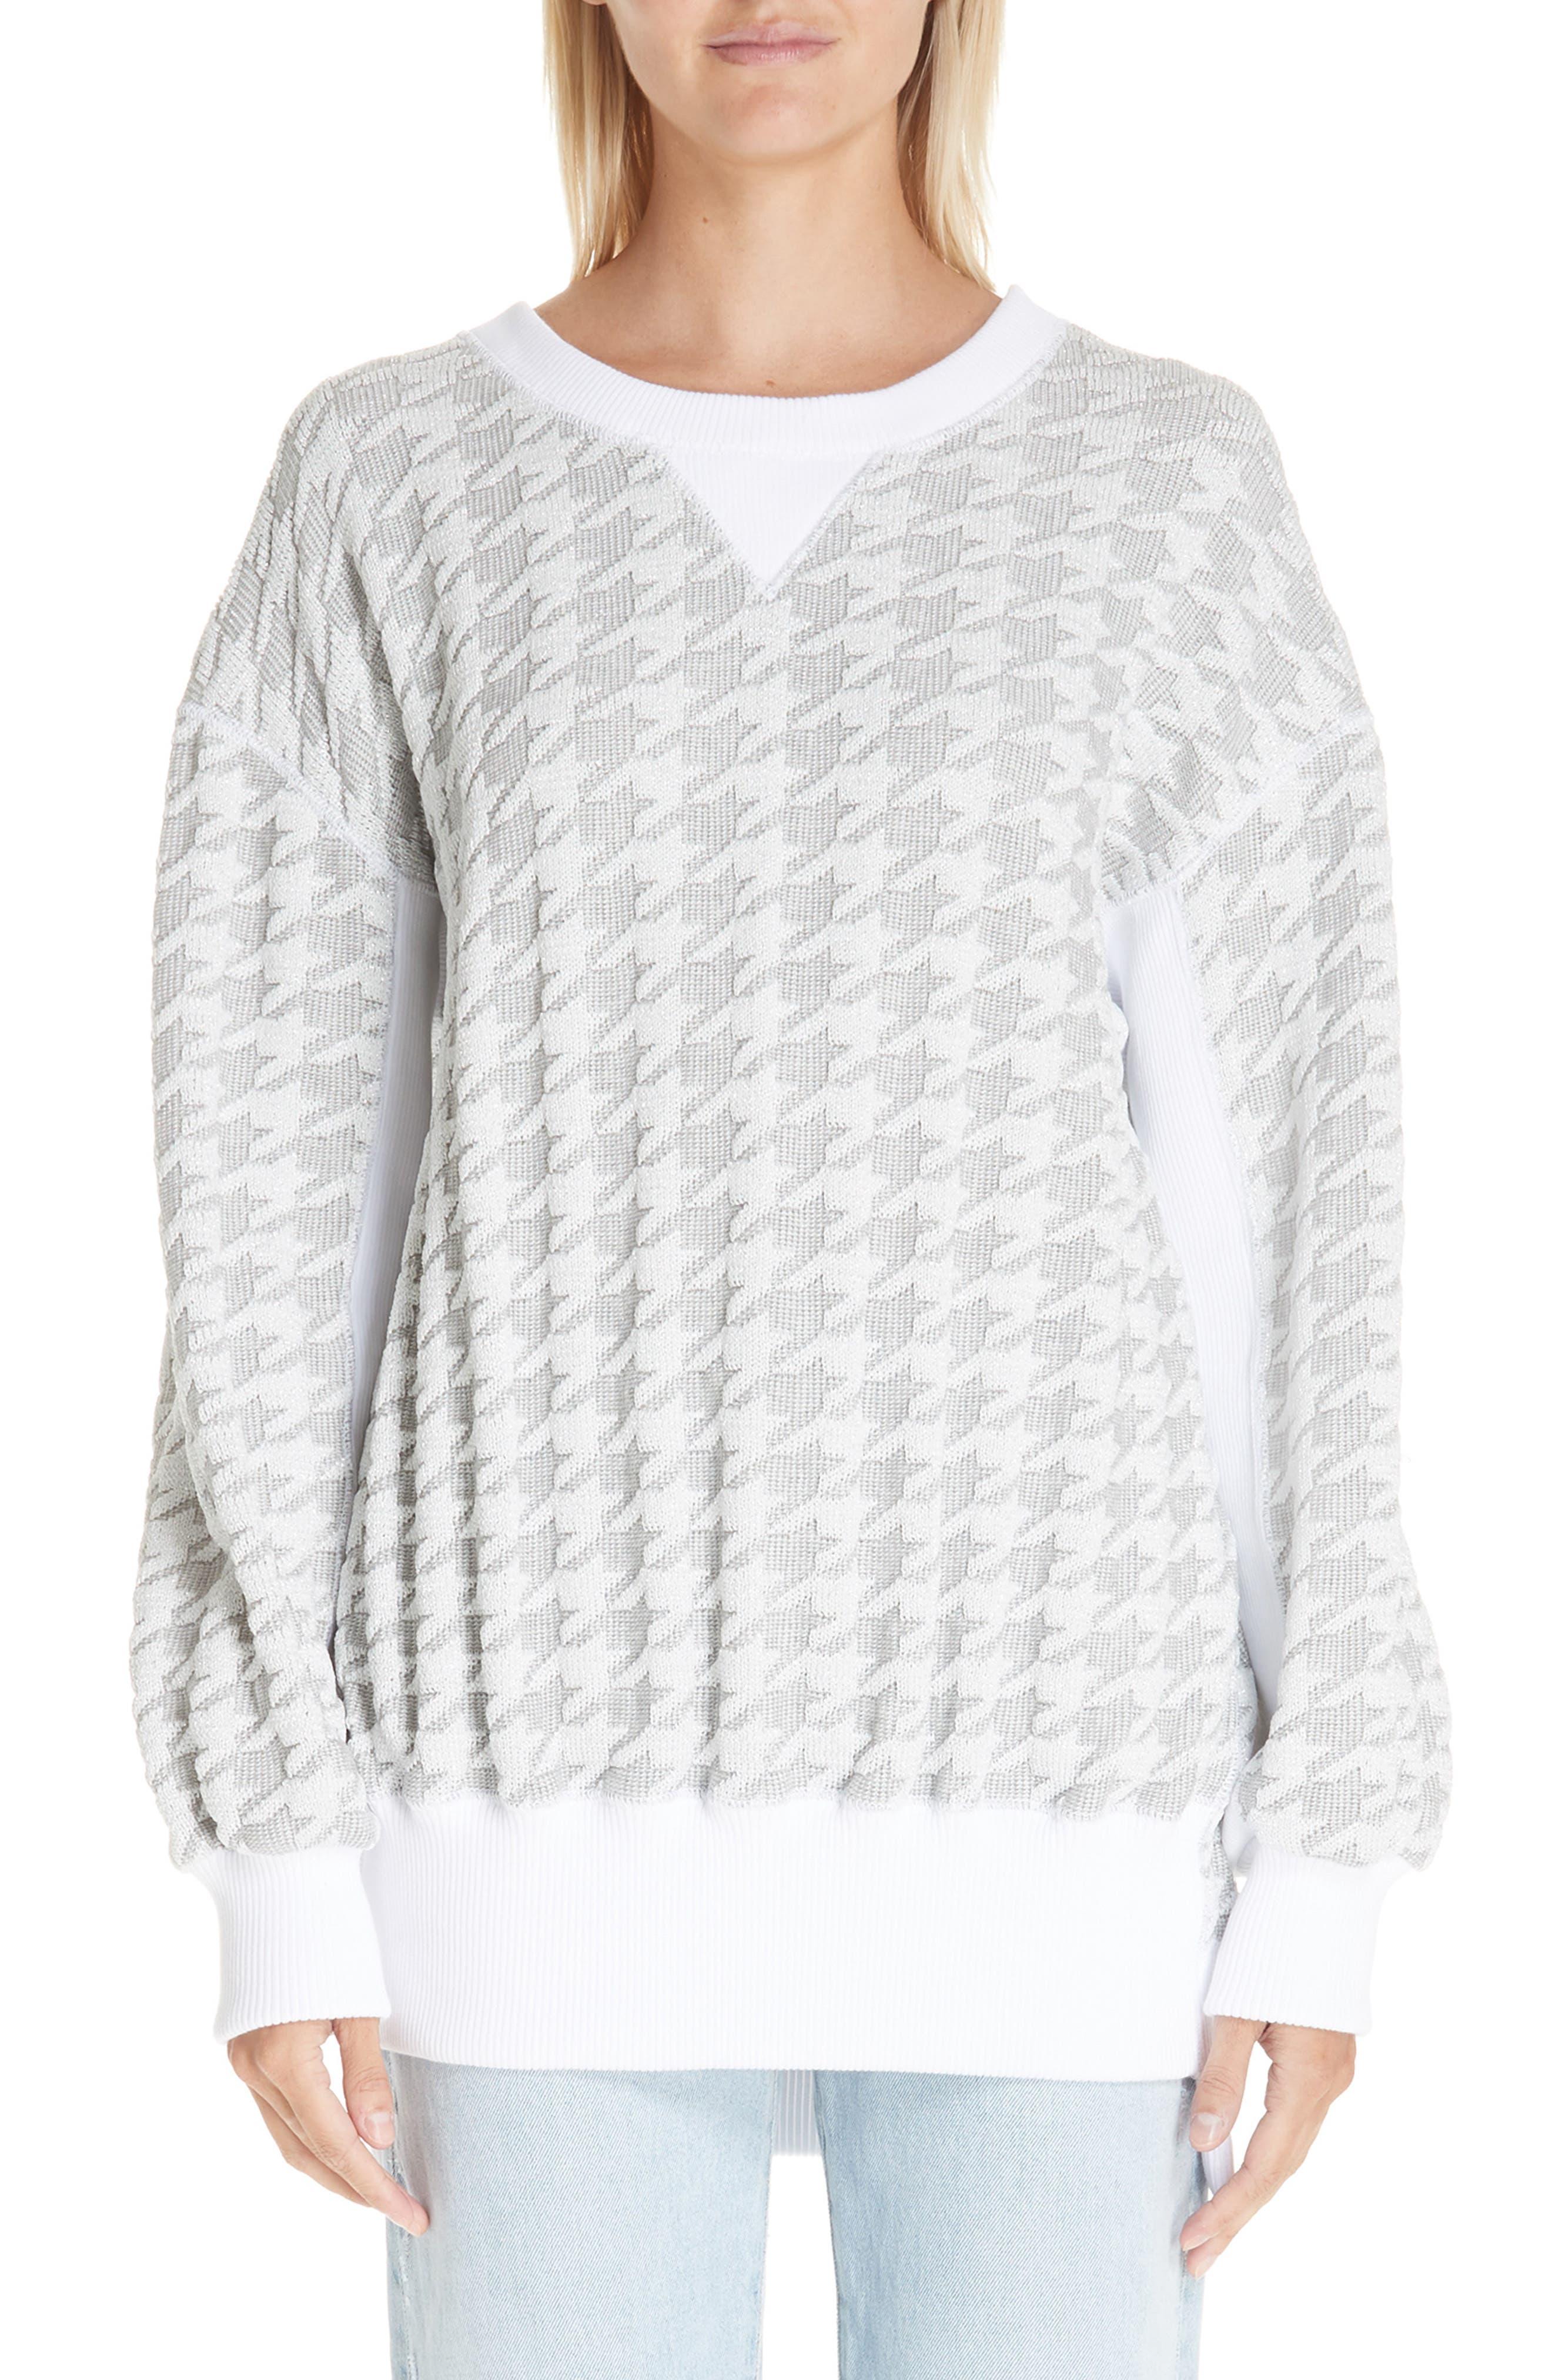 Houndstooth Sweatshirt,                             Main thumbnail 1, color,                             100